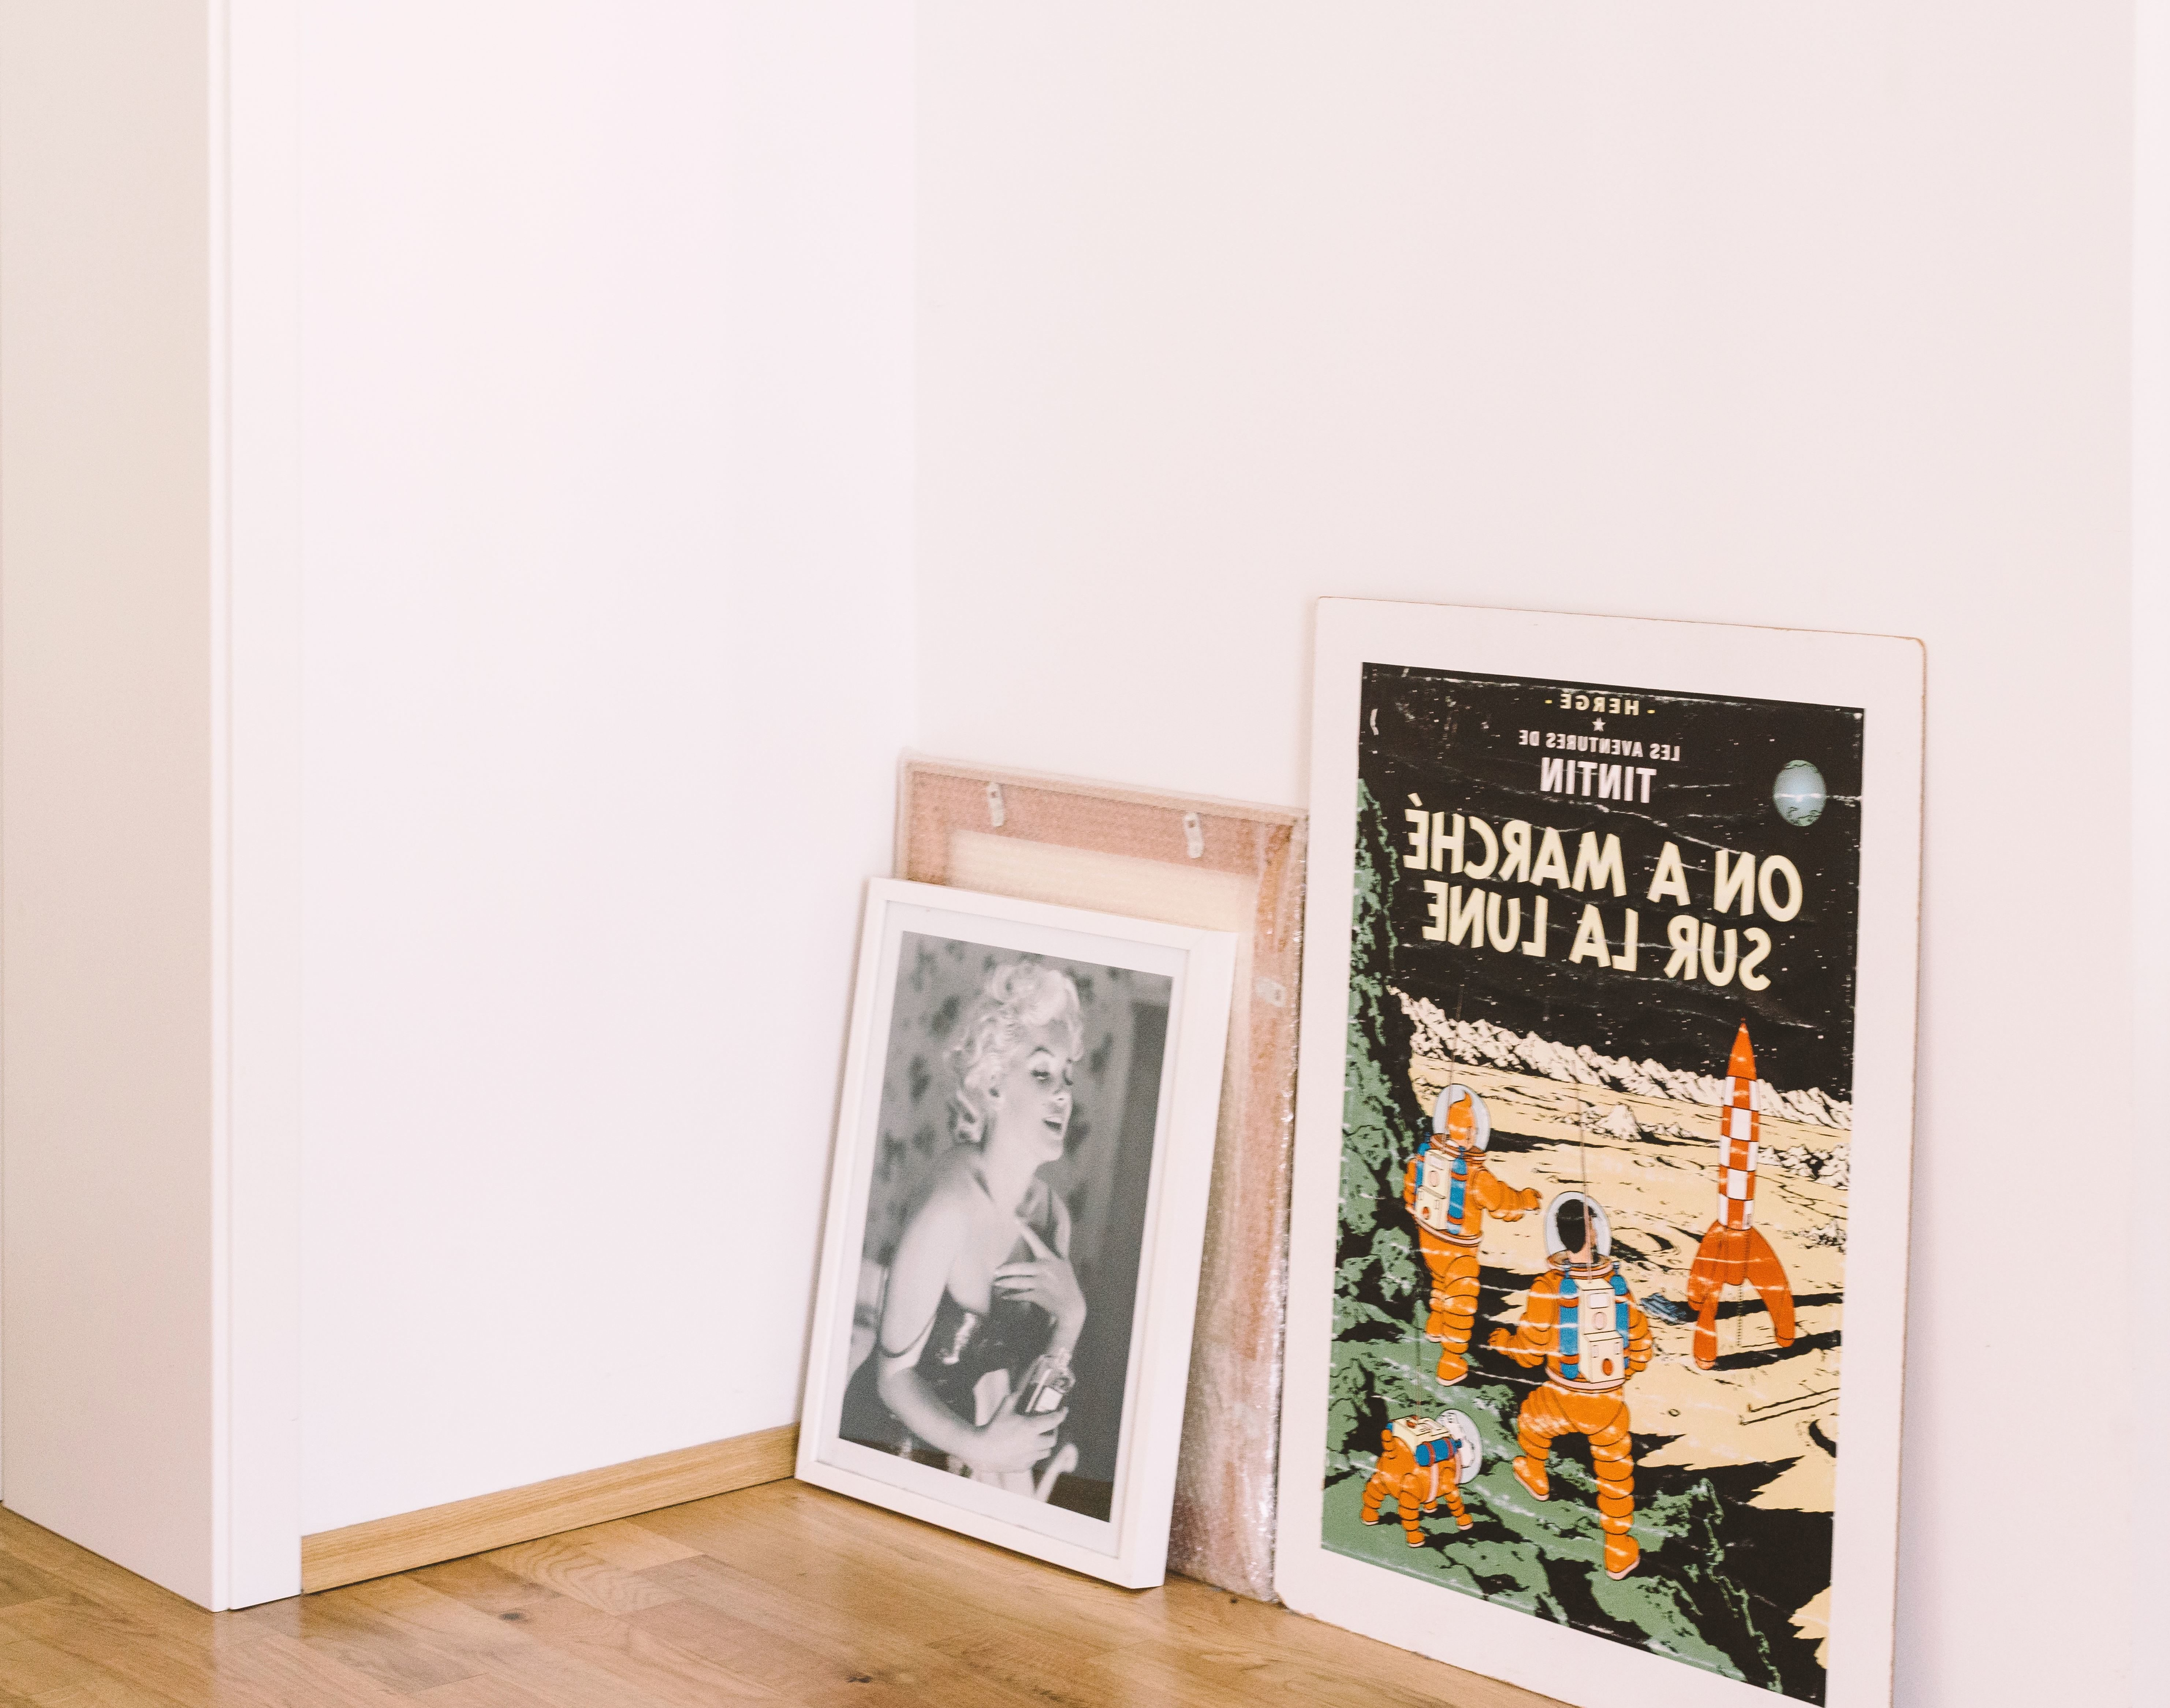 Imagen gratis: retrato, imagen, marco, carteles, obras de arte ...